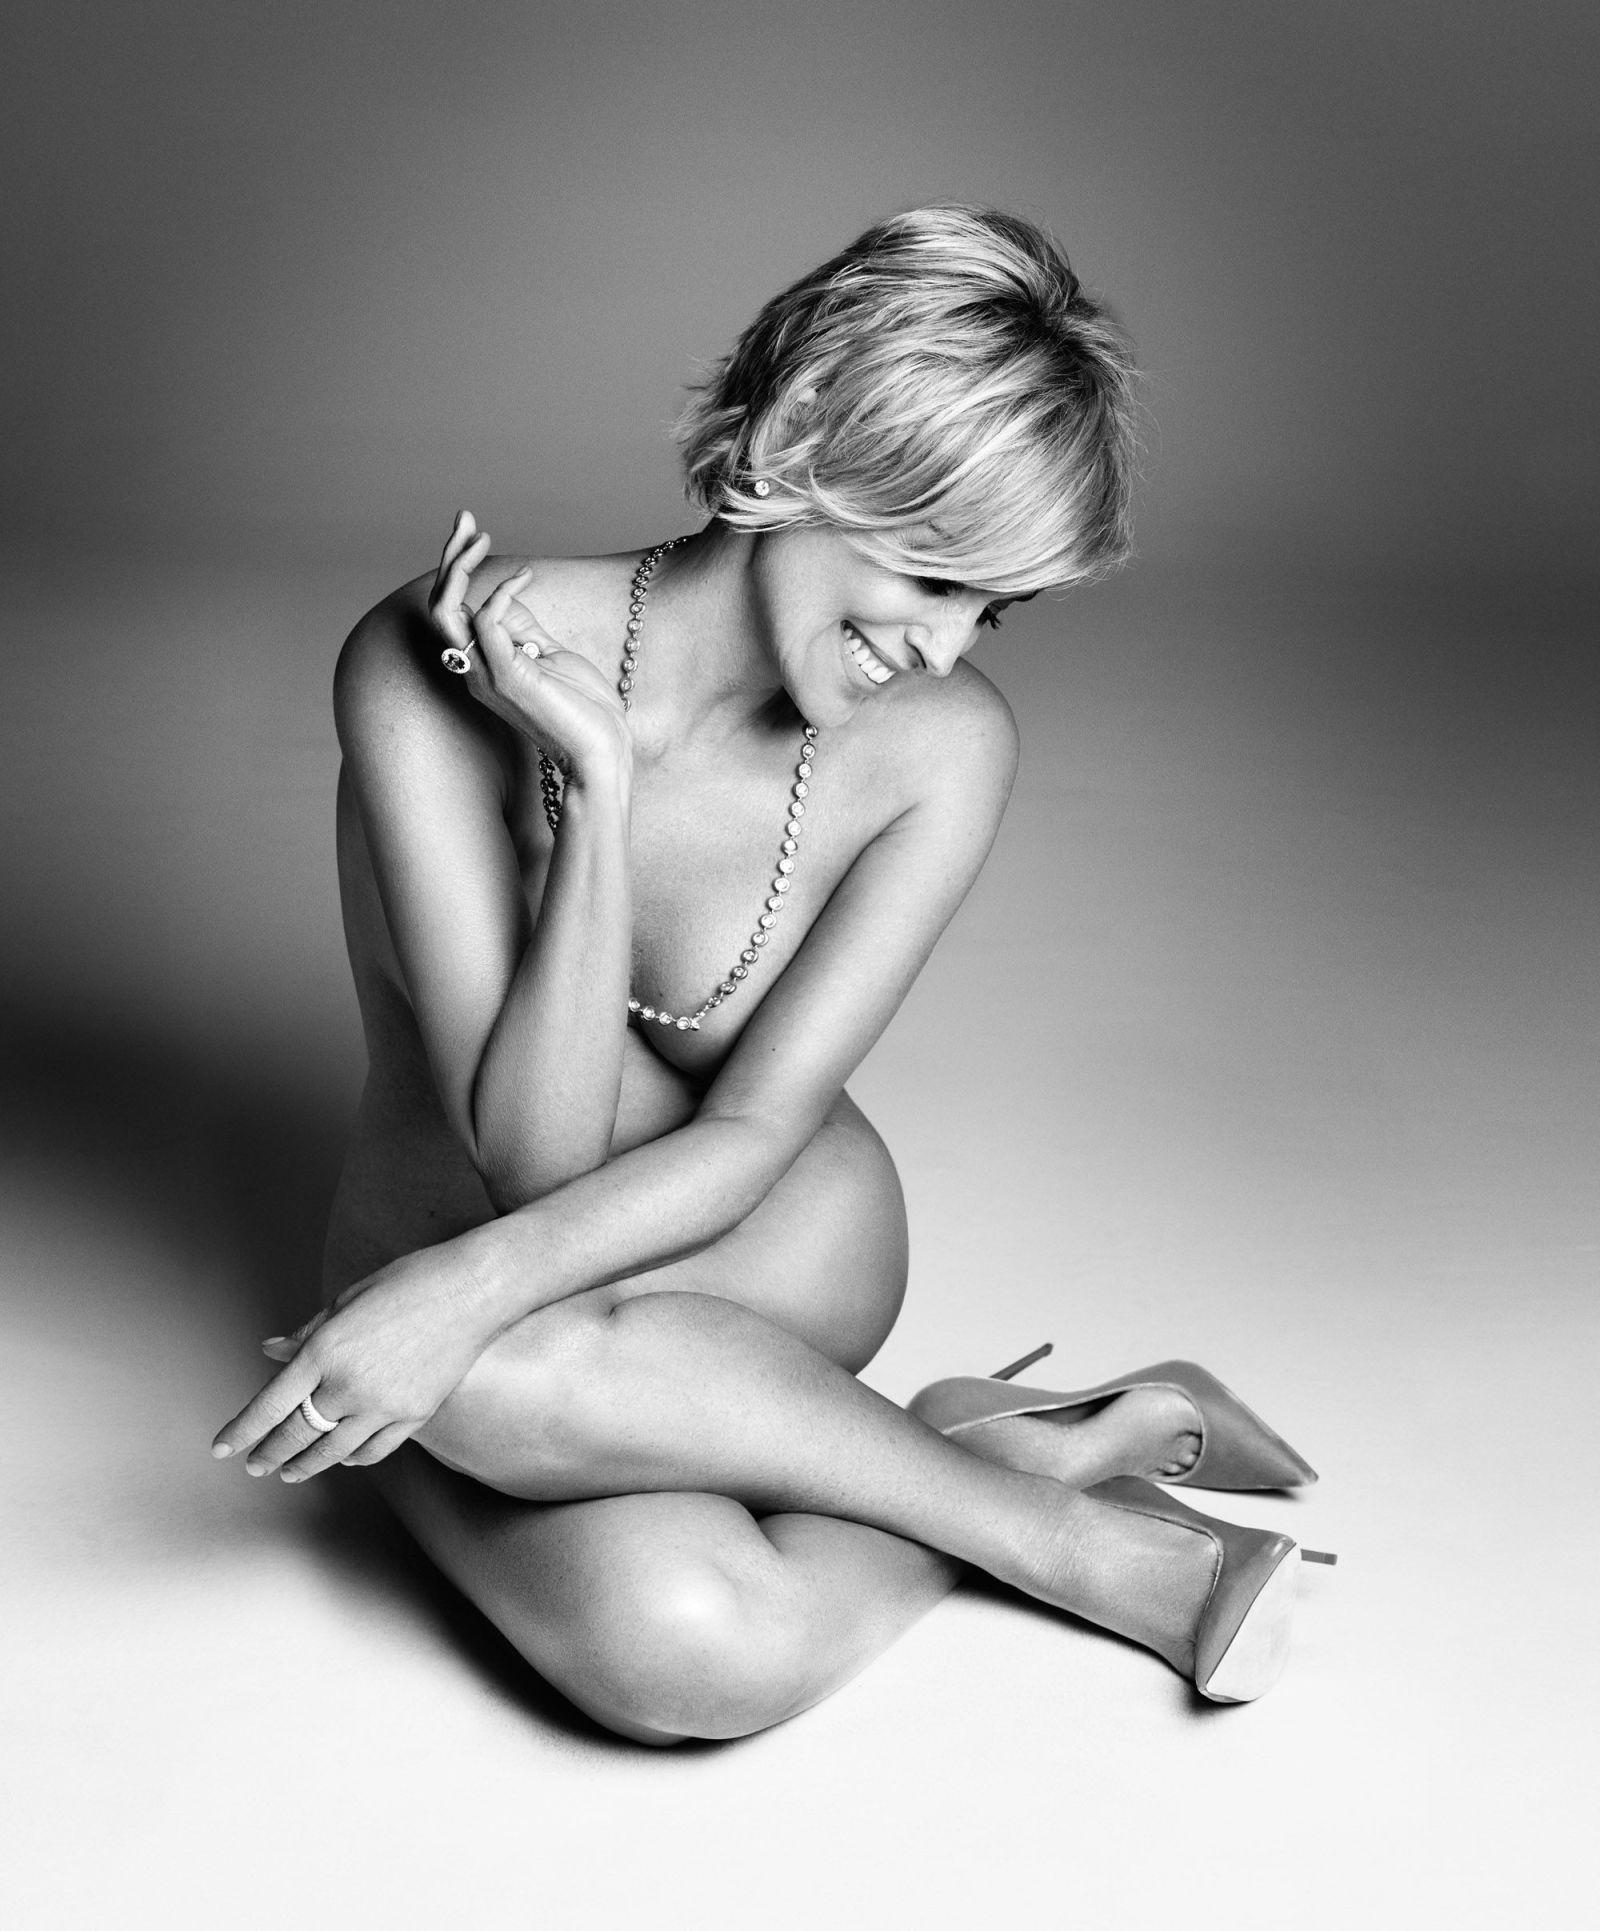 Sharon Stone nude 57 years